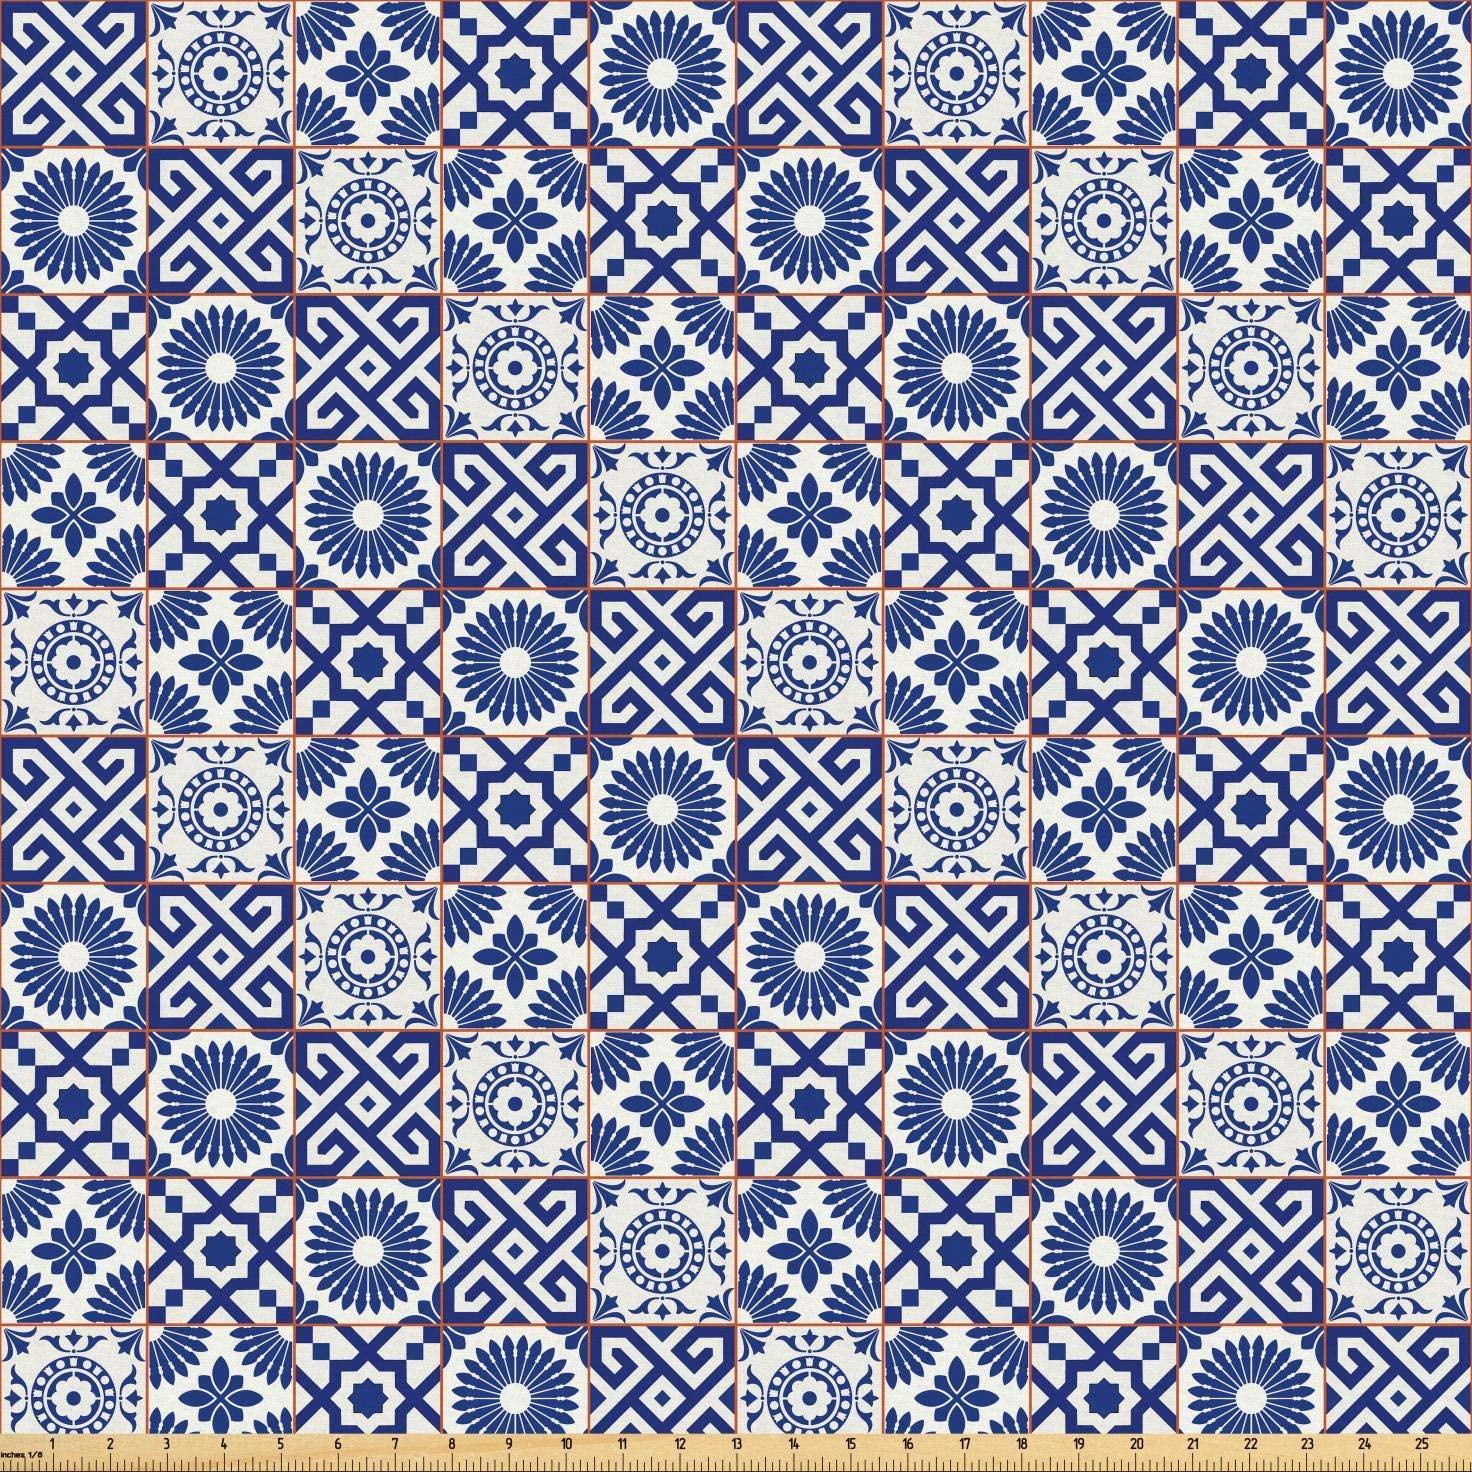 Lunarable Geometric Fabric by The Yard, Azulejo Tile Motifs Portuguese Ceramic Pattern European Art, Microfiber Fabric for Arts and Crafts Textiles & Decor, 3 Yards, Royal Blue Ivory Burnt Sienna